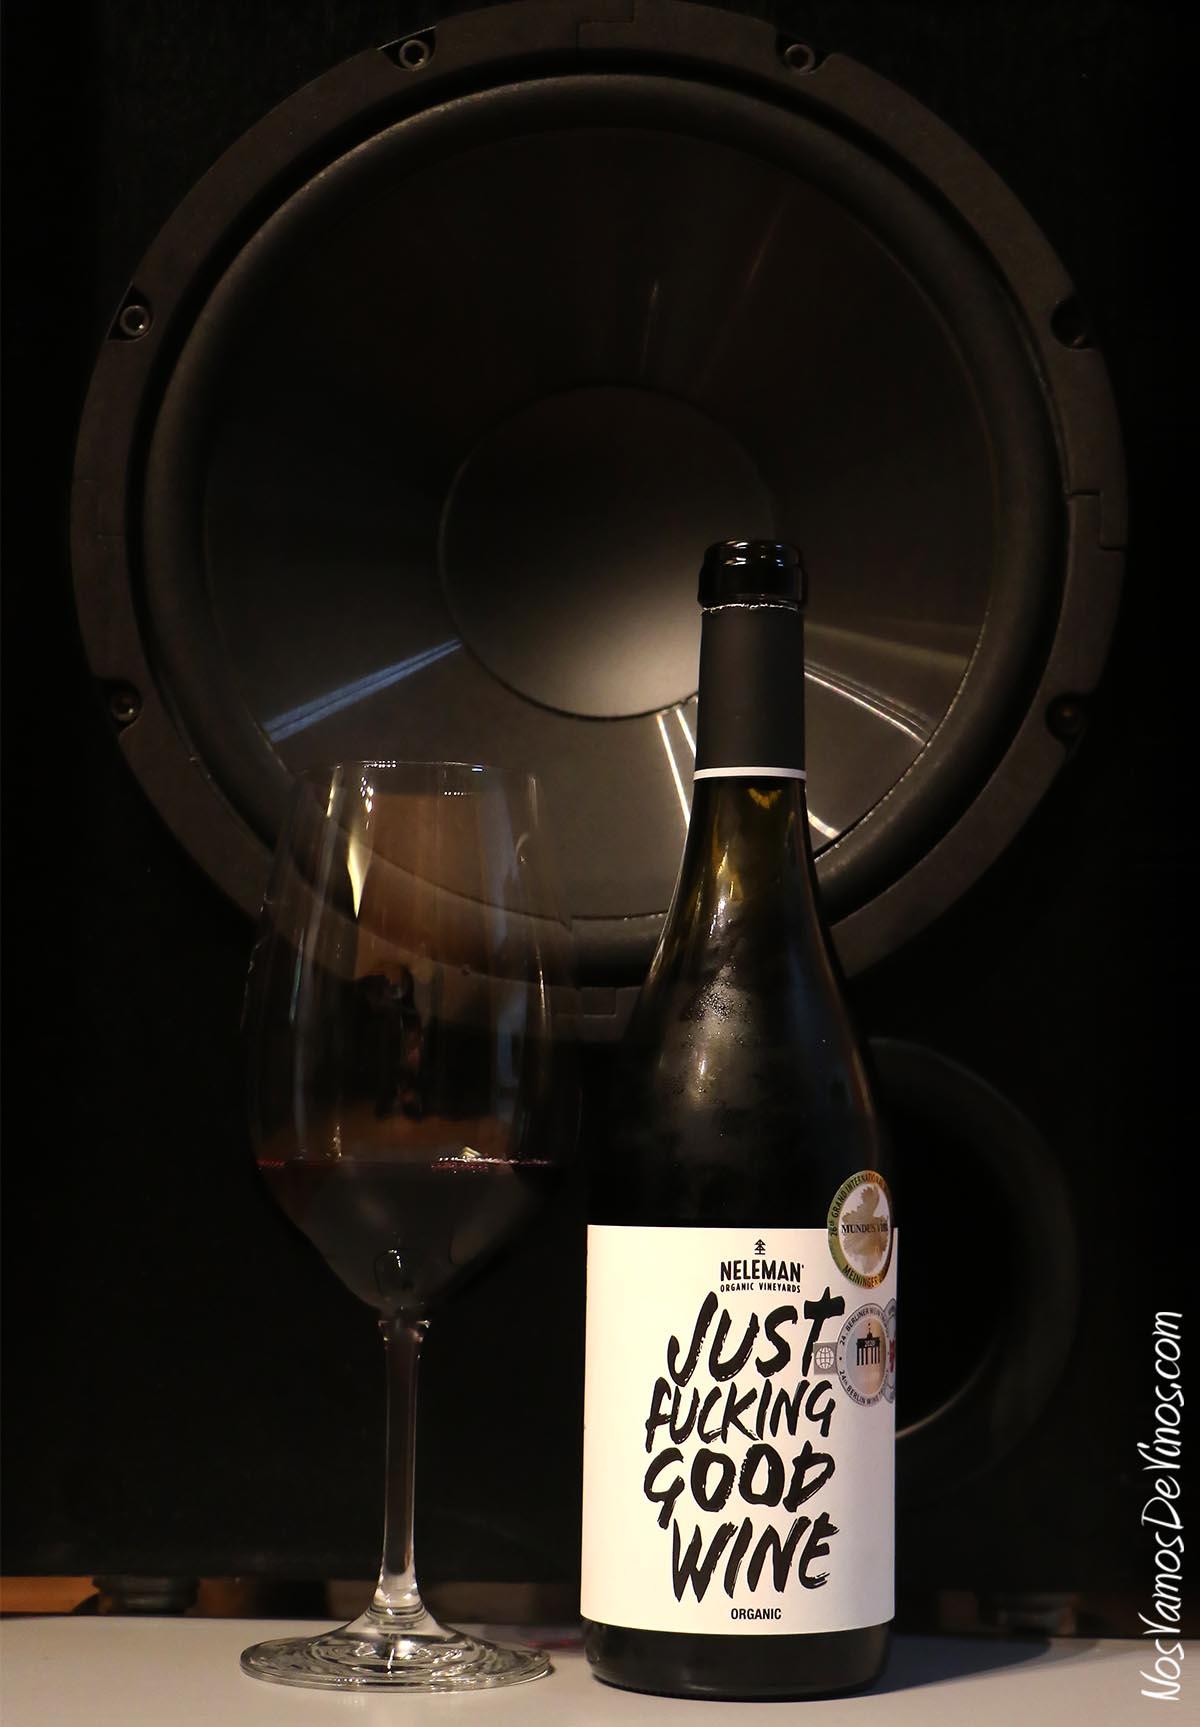 Just Fucking Good Wine Tinto 2018